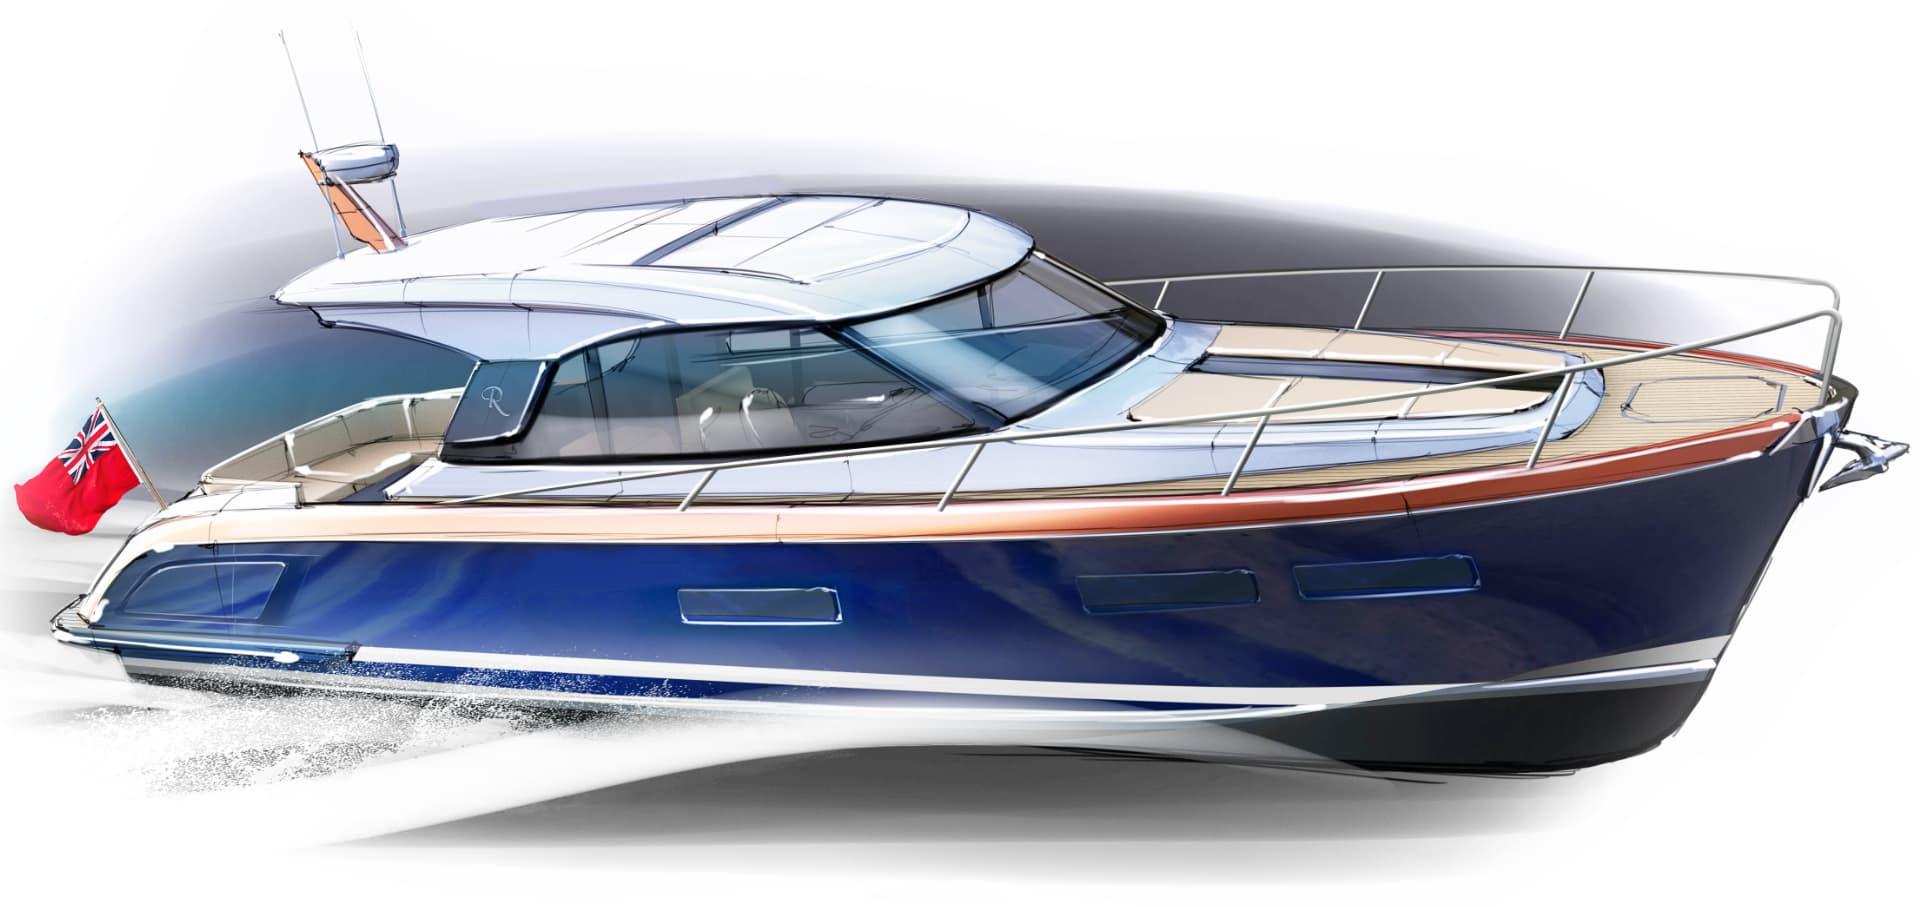 Rustler 41 Motor Yacht - three quarter front profile